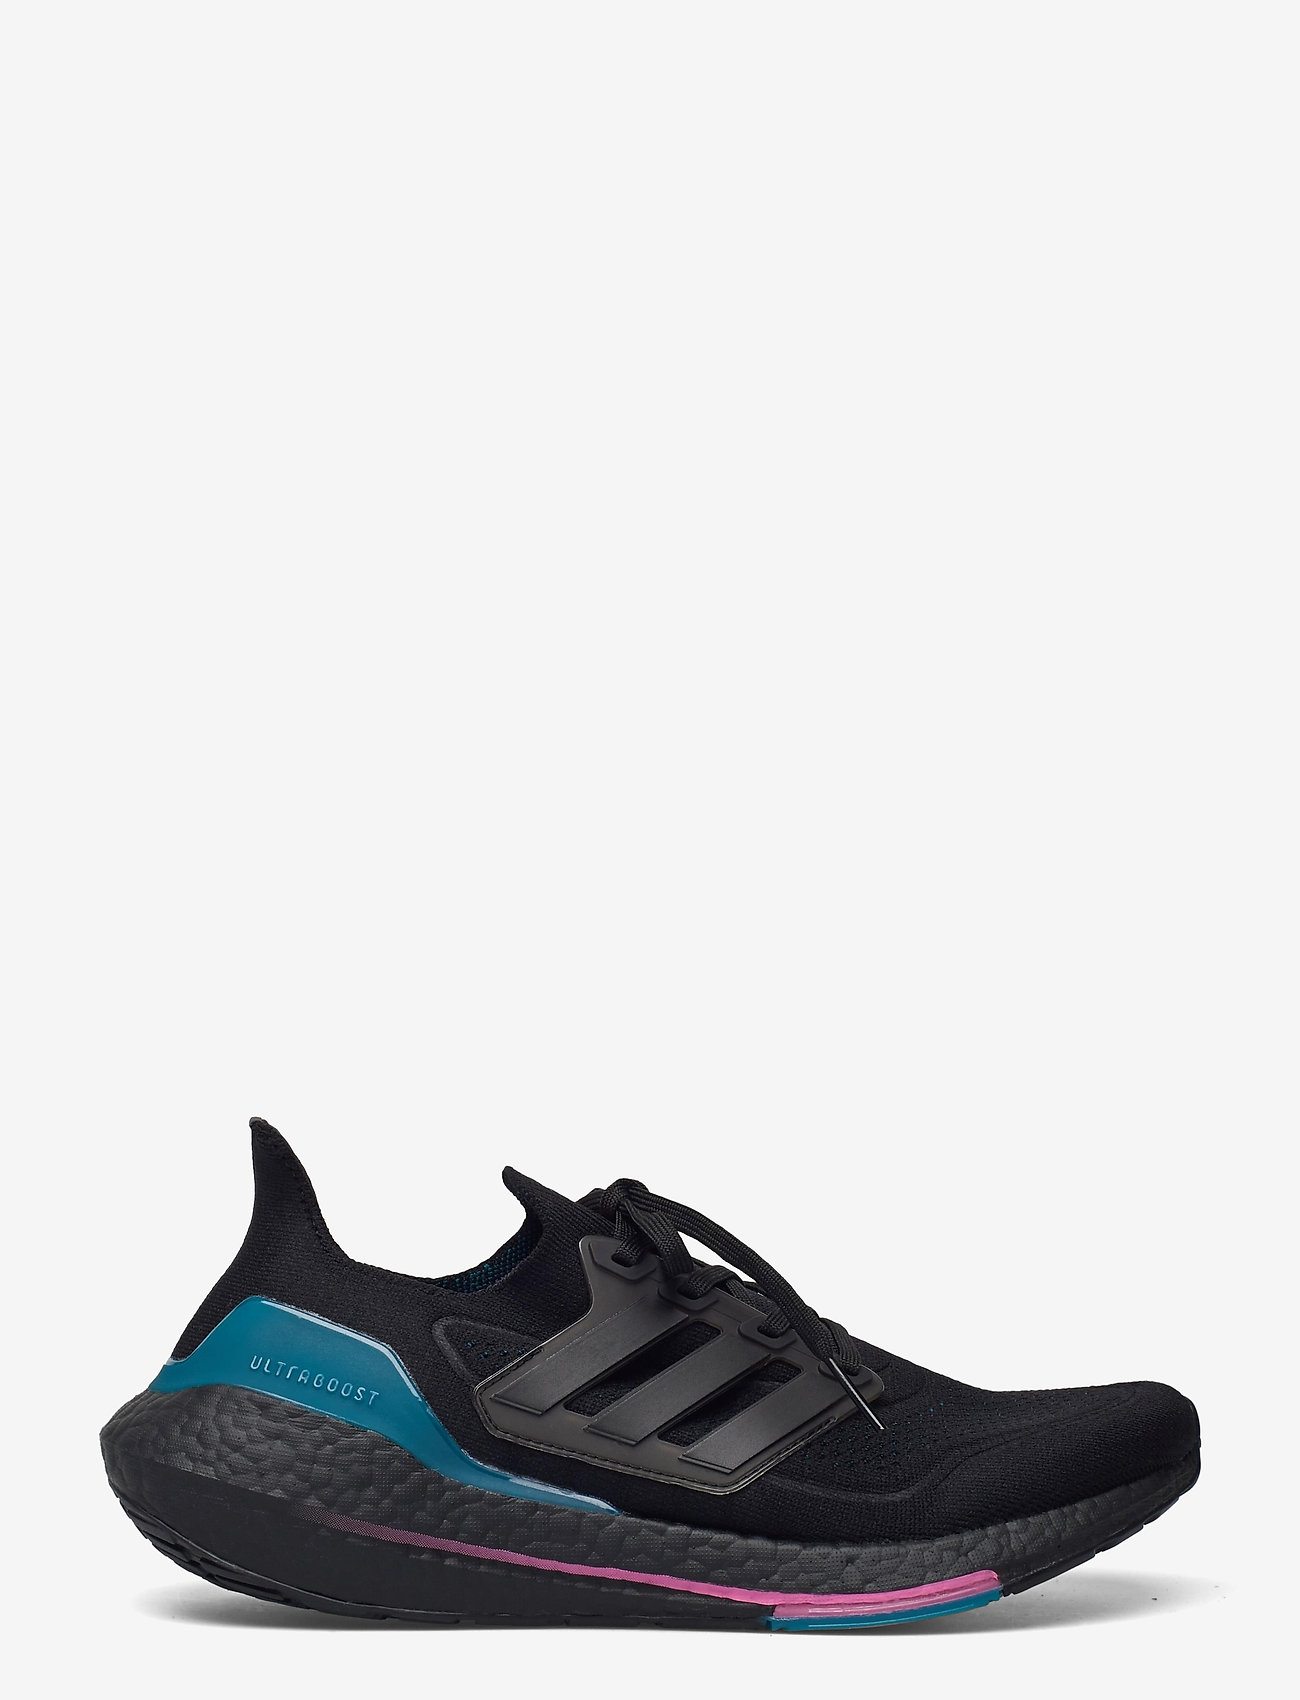 adidas Performance - ULTRABOOST 21 - laufschuhe - cblack/carbon/acttea - 1